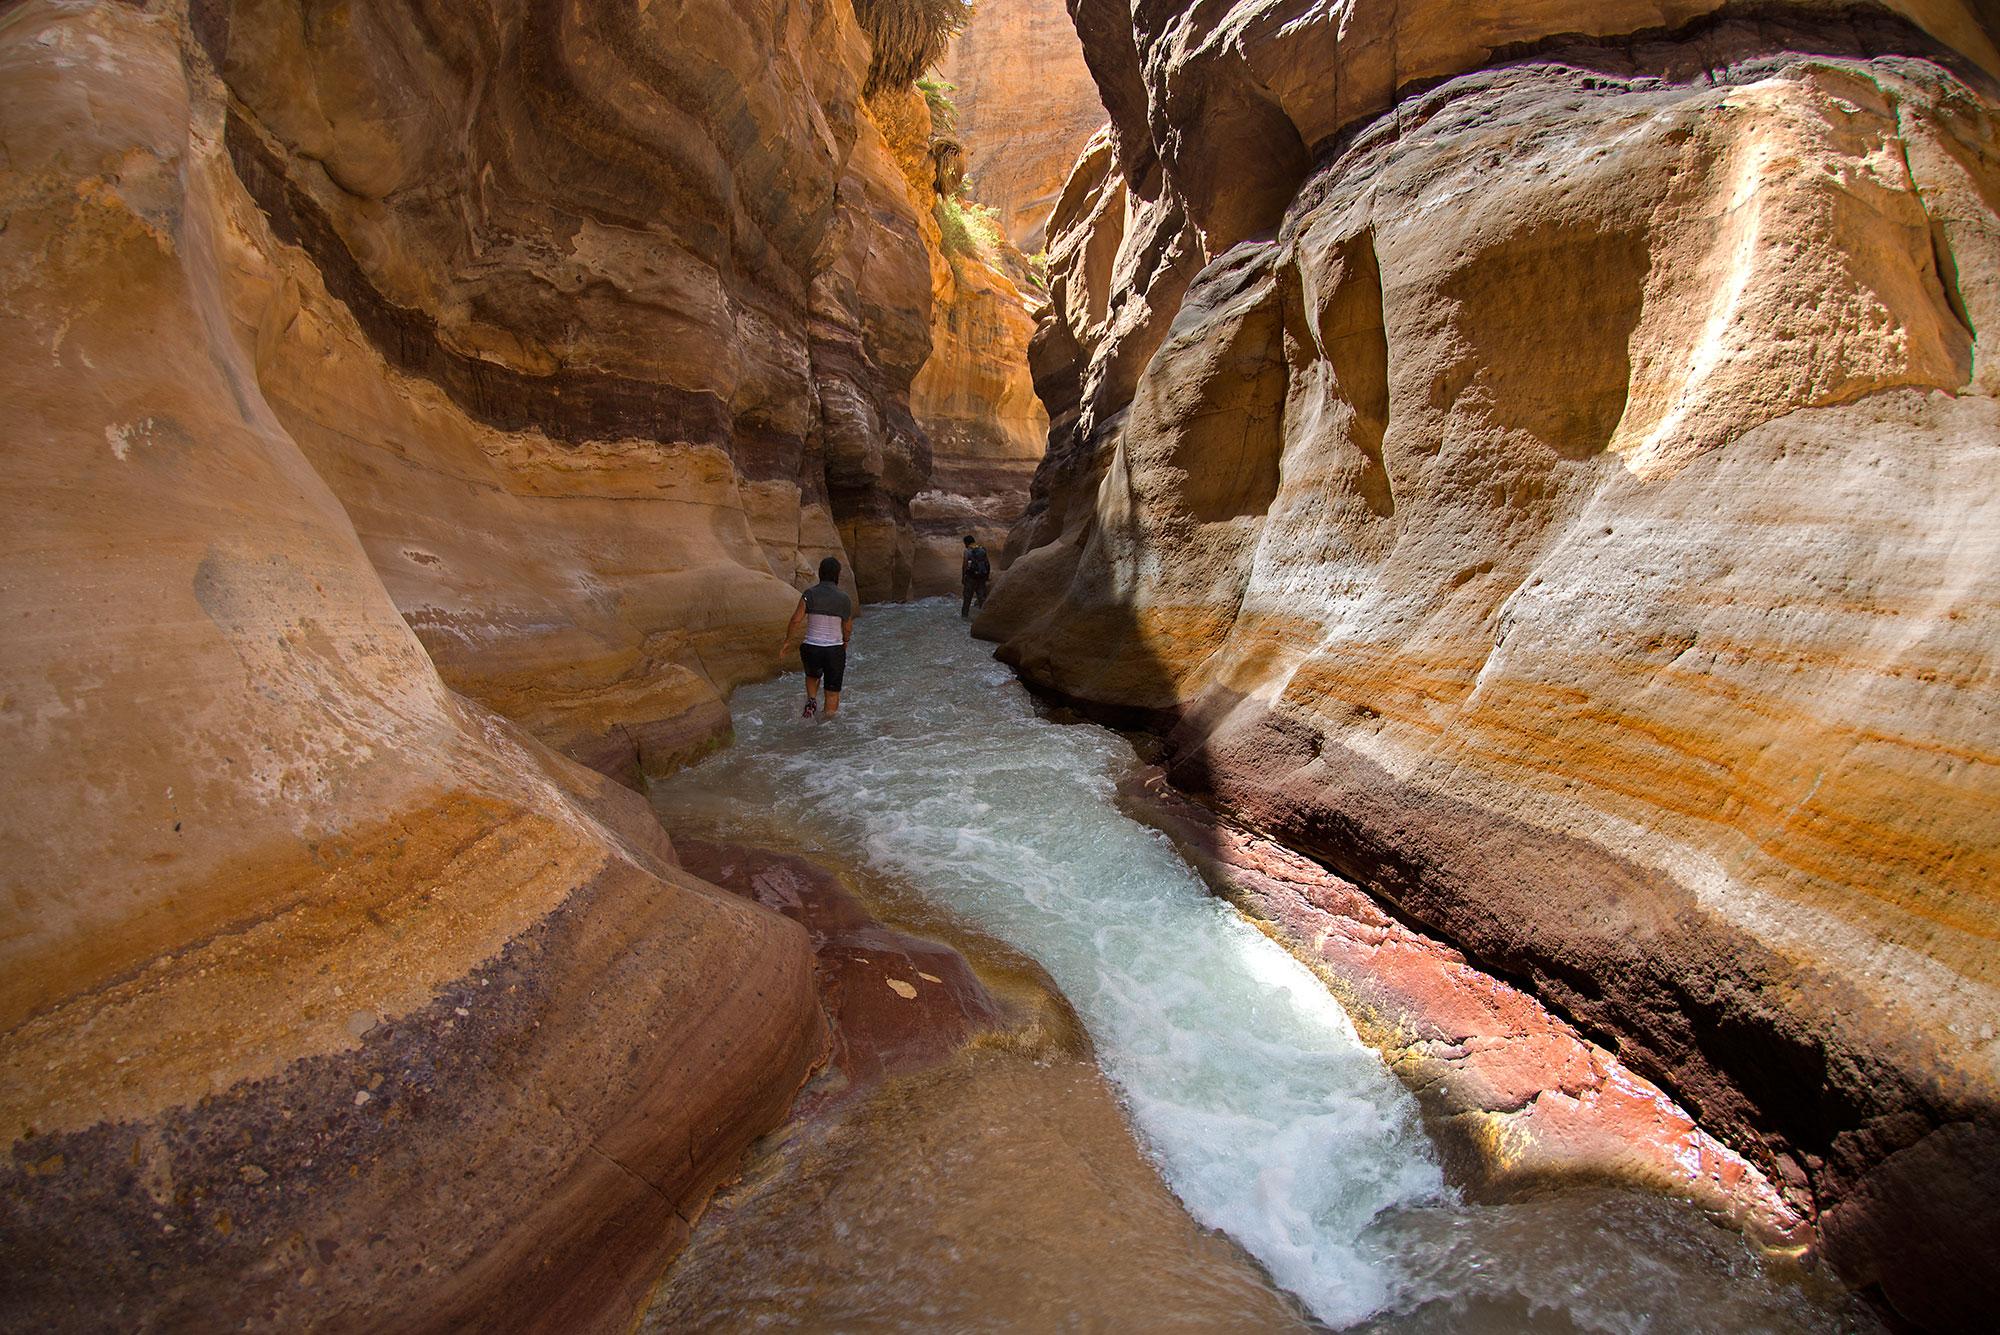 Beautitful Sandstone formations at Wadi Zarka Maìn